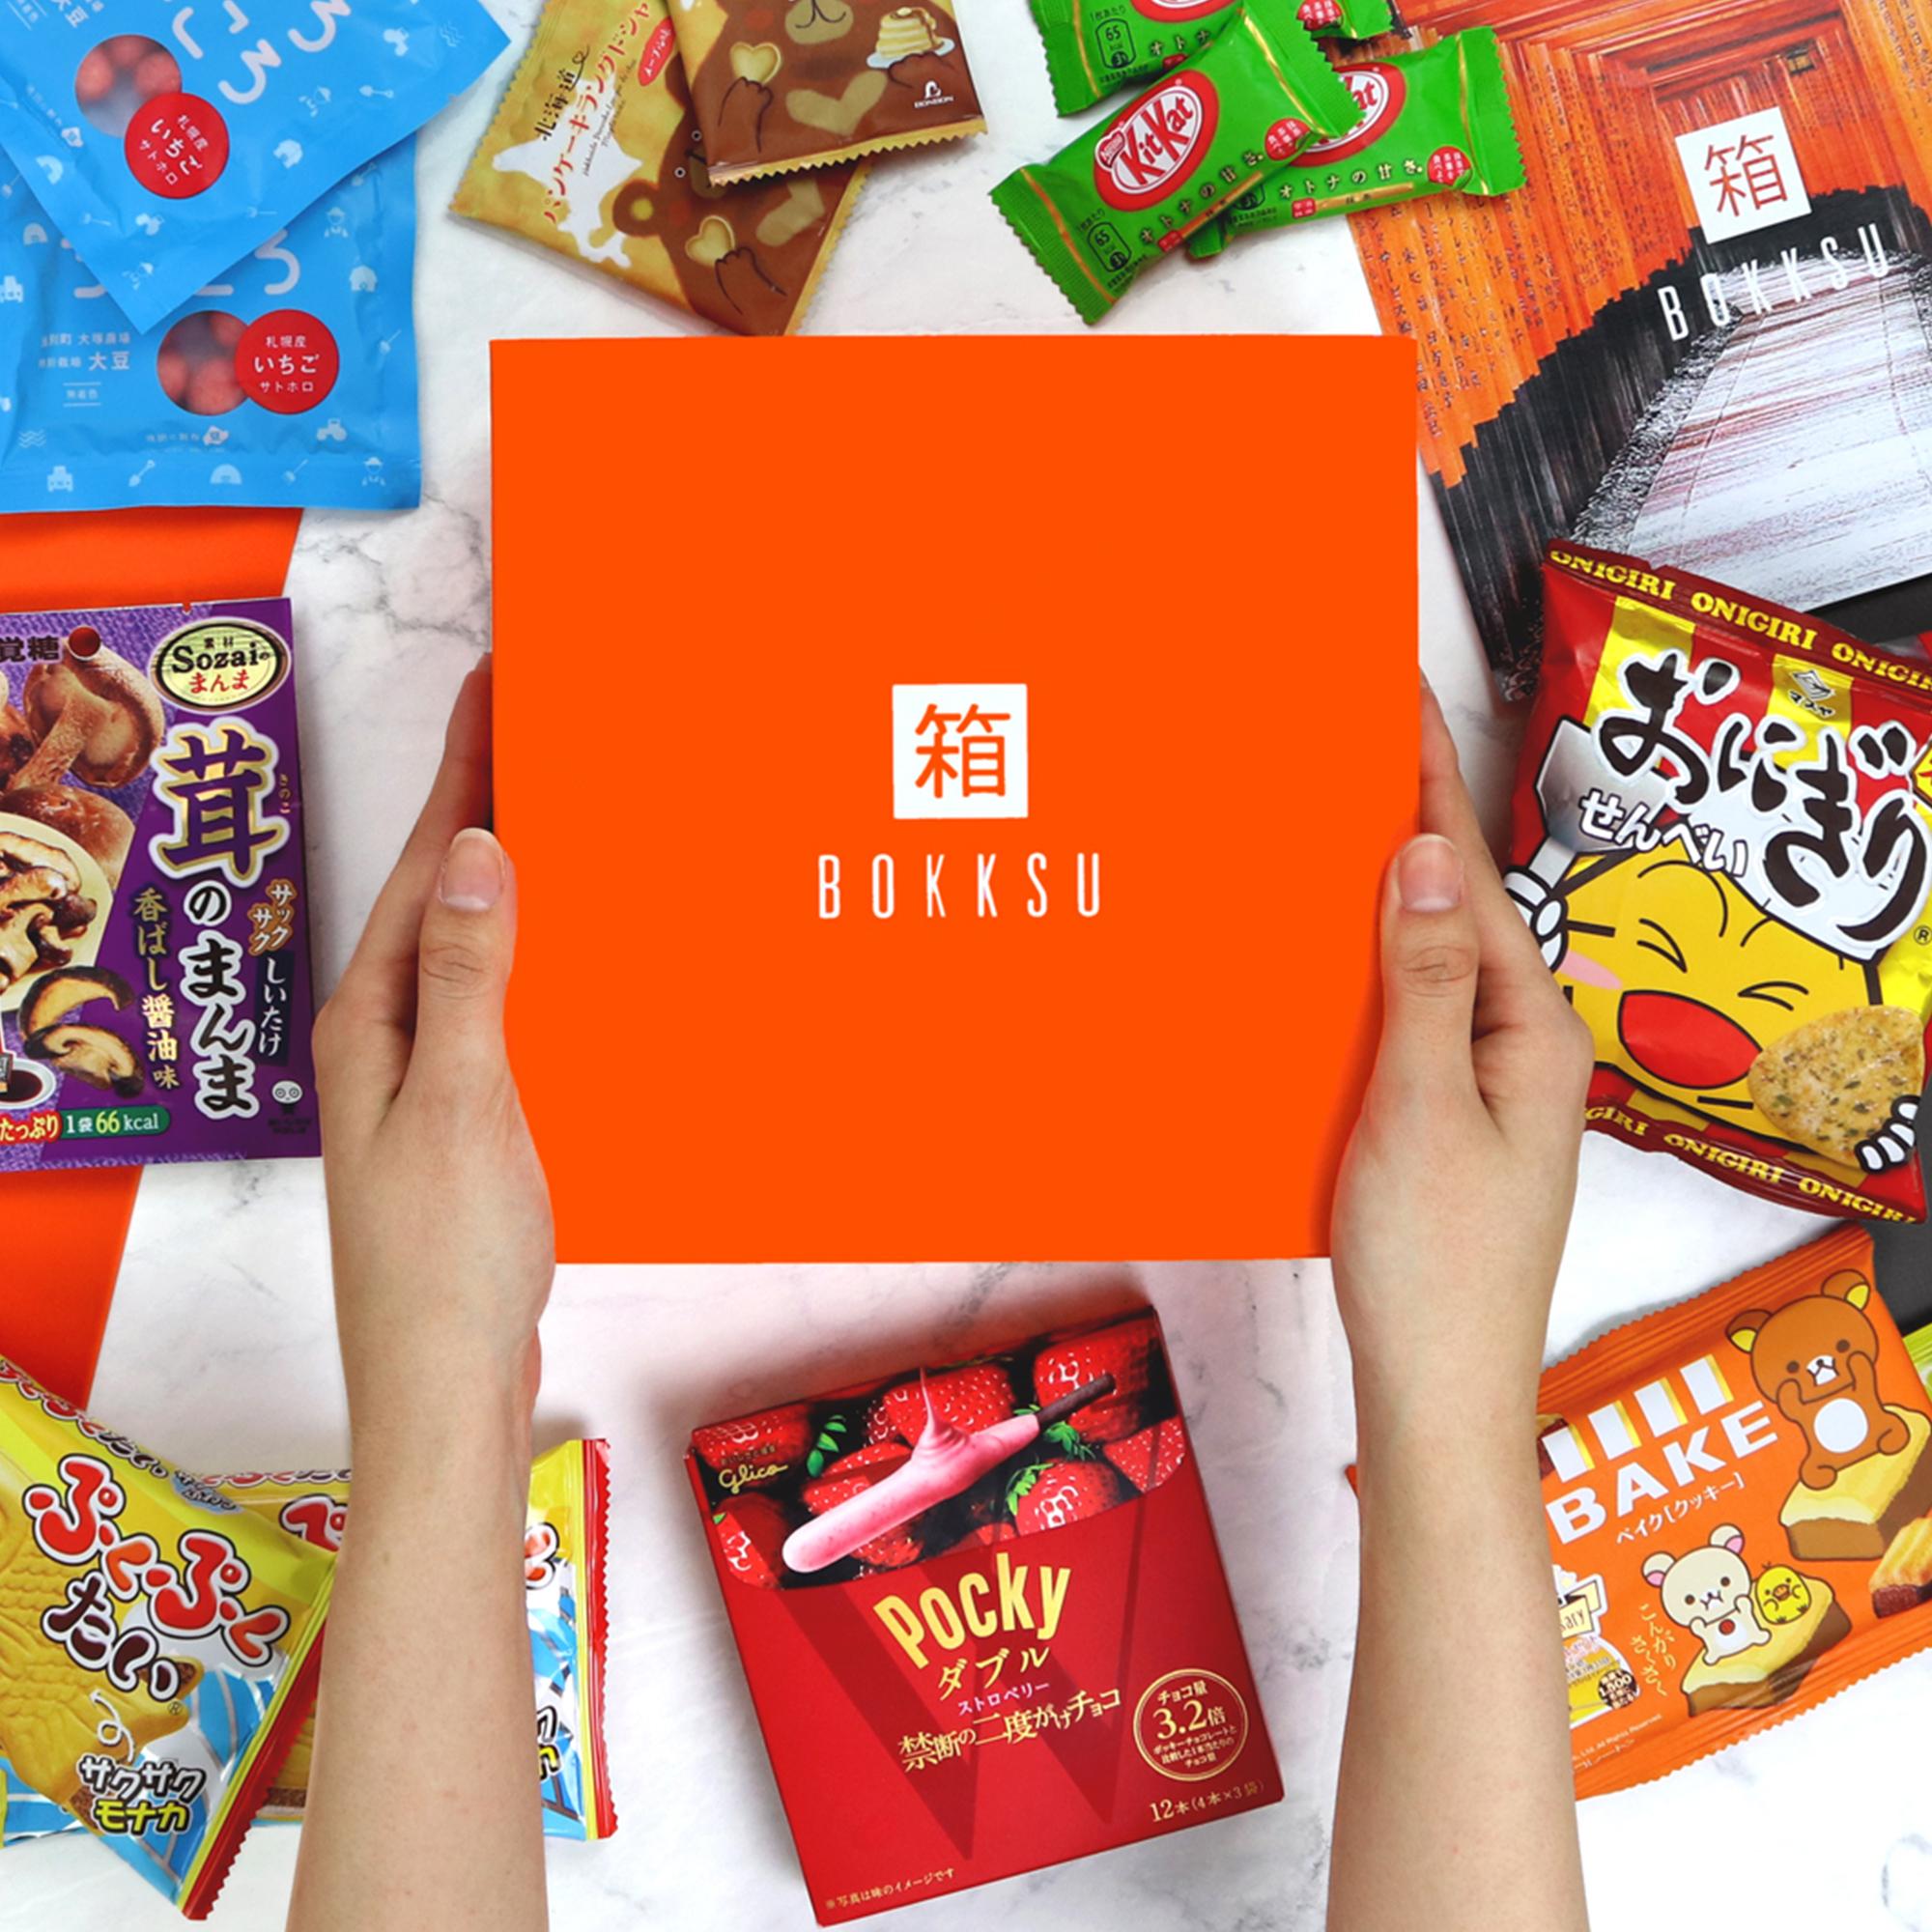 Bokksu - Authentic Japanese Snack & Candy Subscription: Classic Box [Classic Bokksu] $21.84